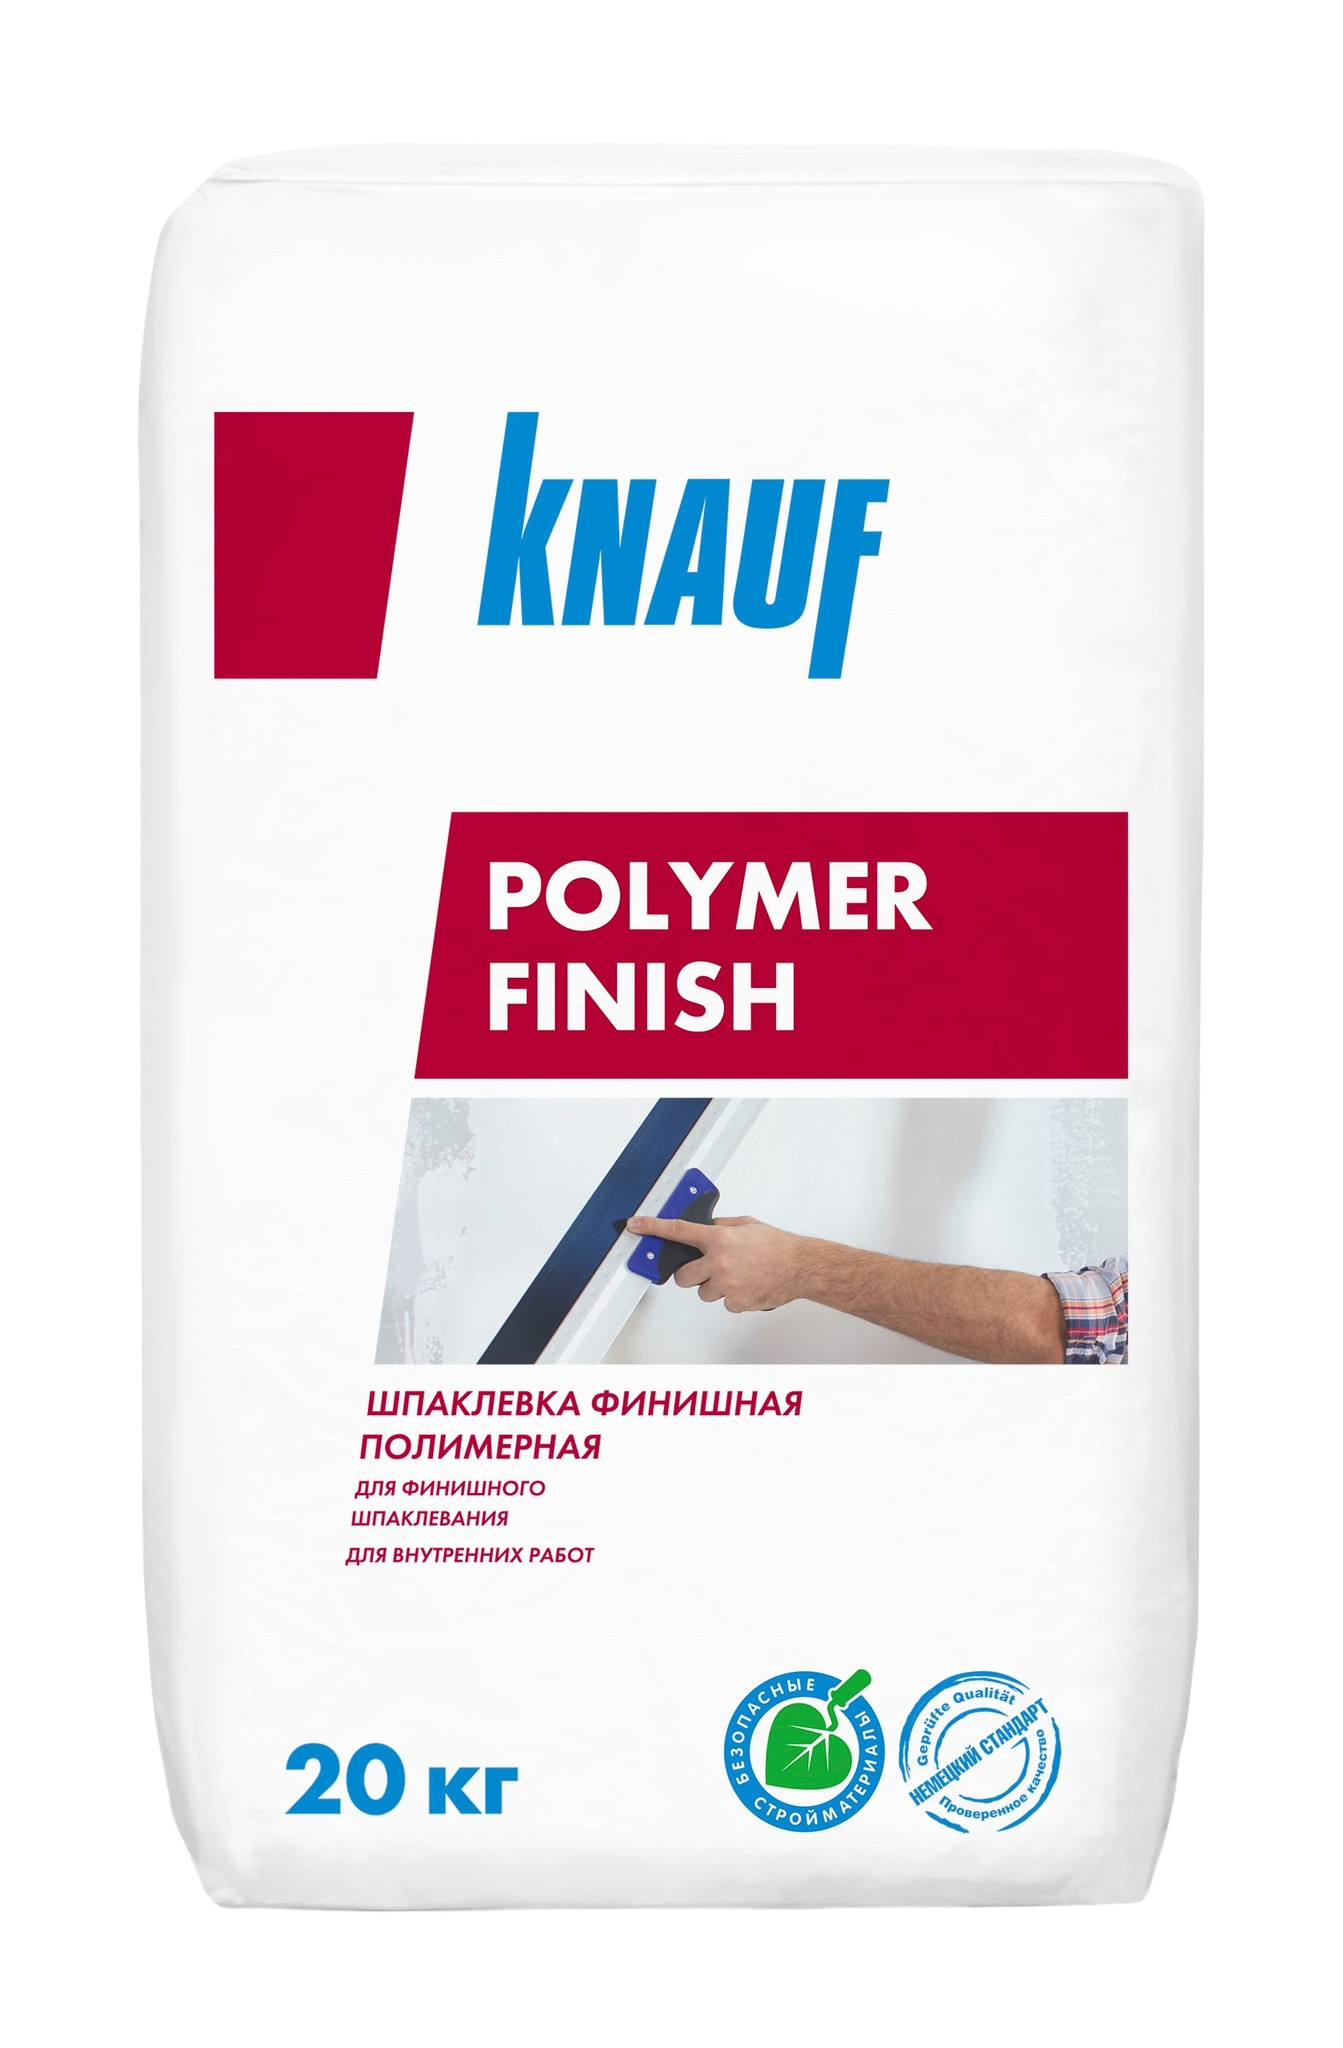 Шпаклевки Шпаклёвка Knauf Полимер Финиш полимерно-цементная, 20 кг ee0c56b049a34bb095be7ed6938a9952.jpg